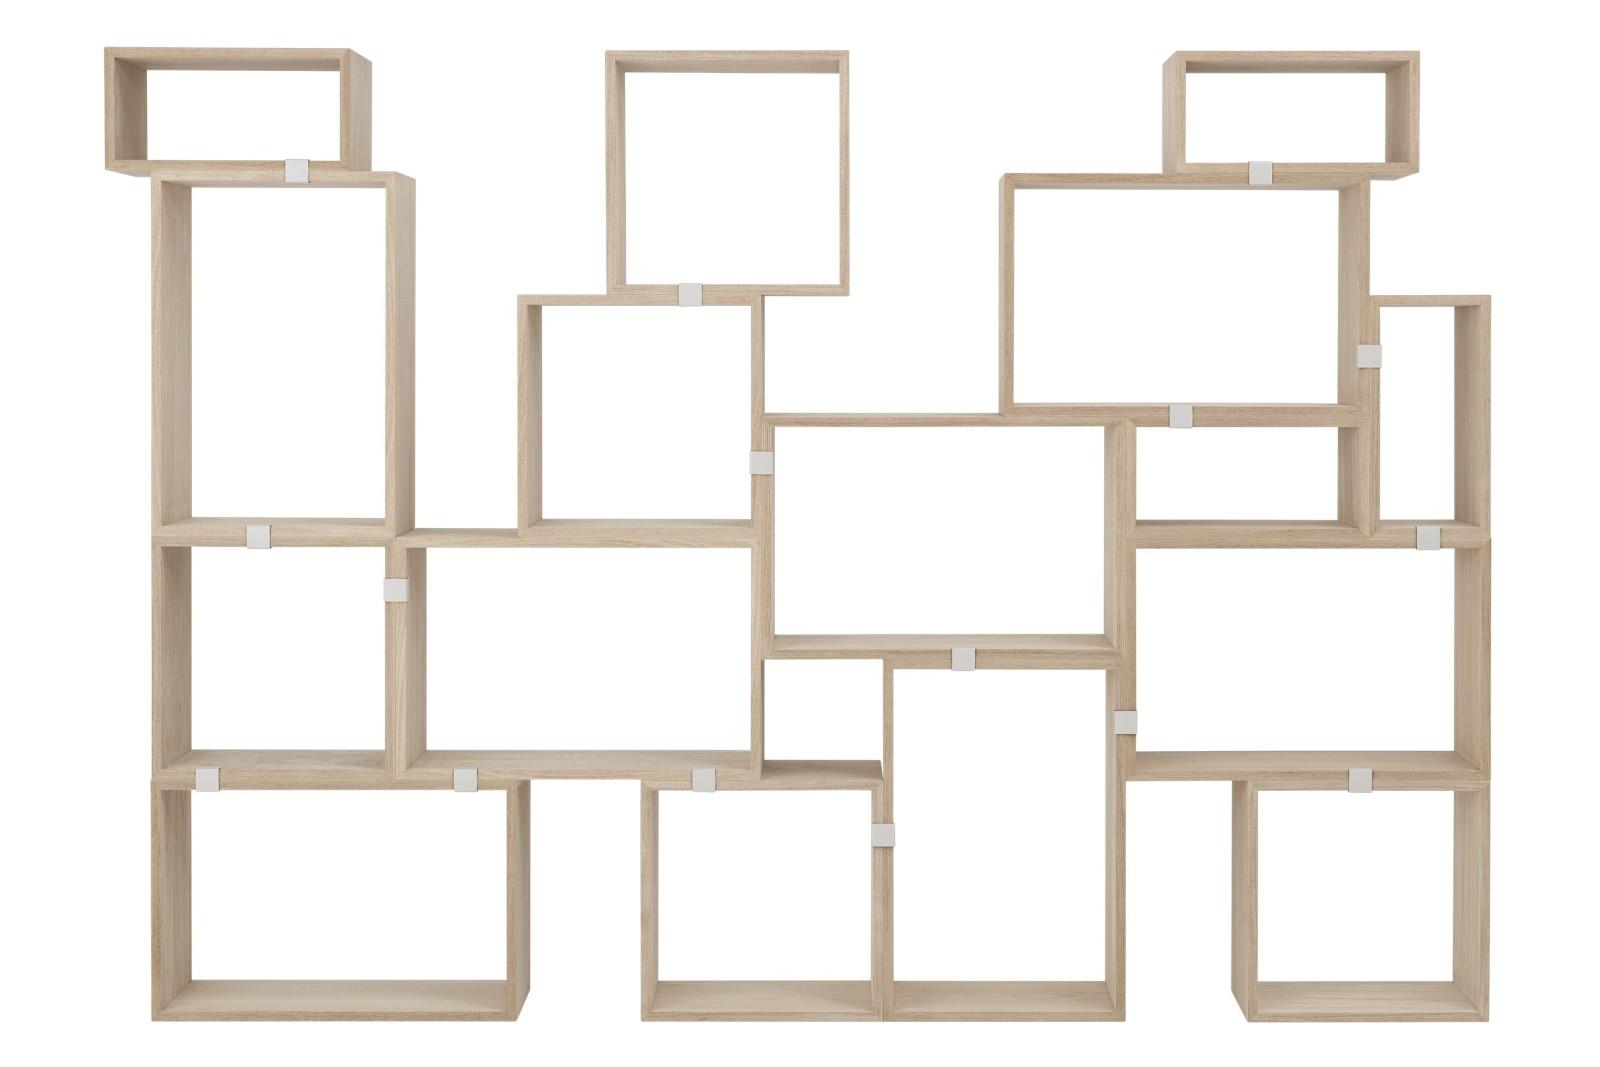 Stacked Storage System 2.0 - Configuration 10 Oak